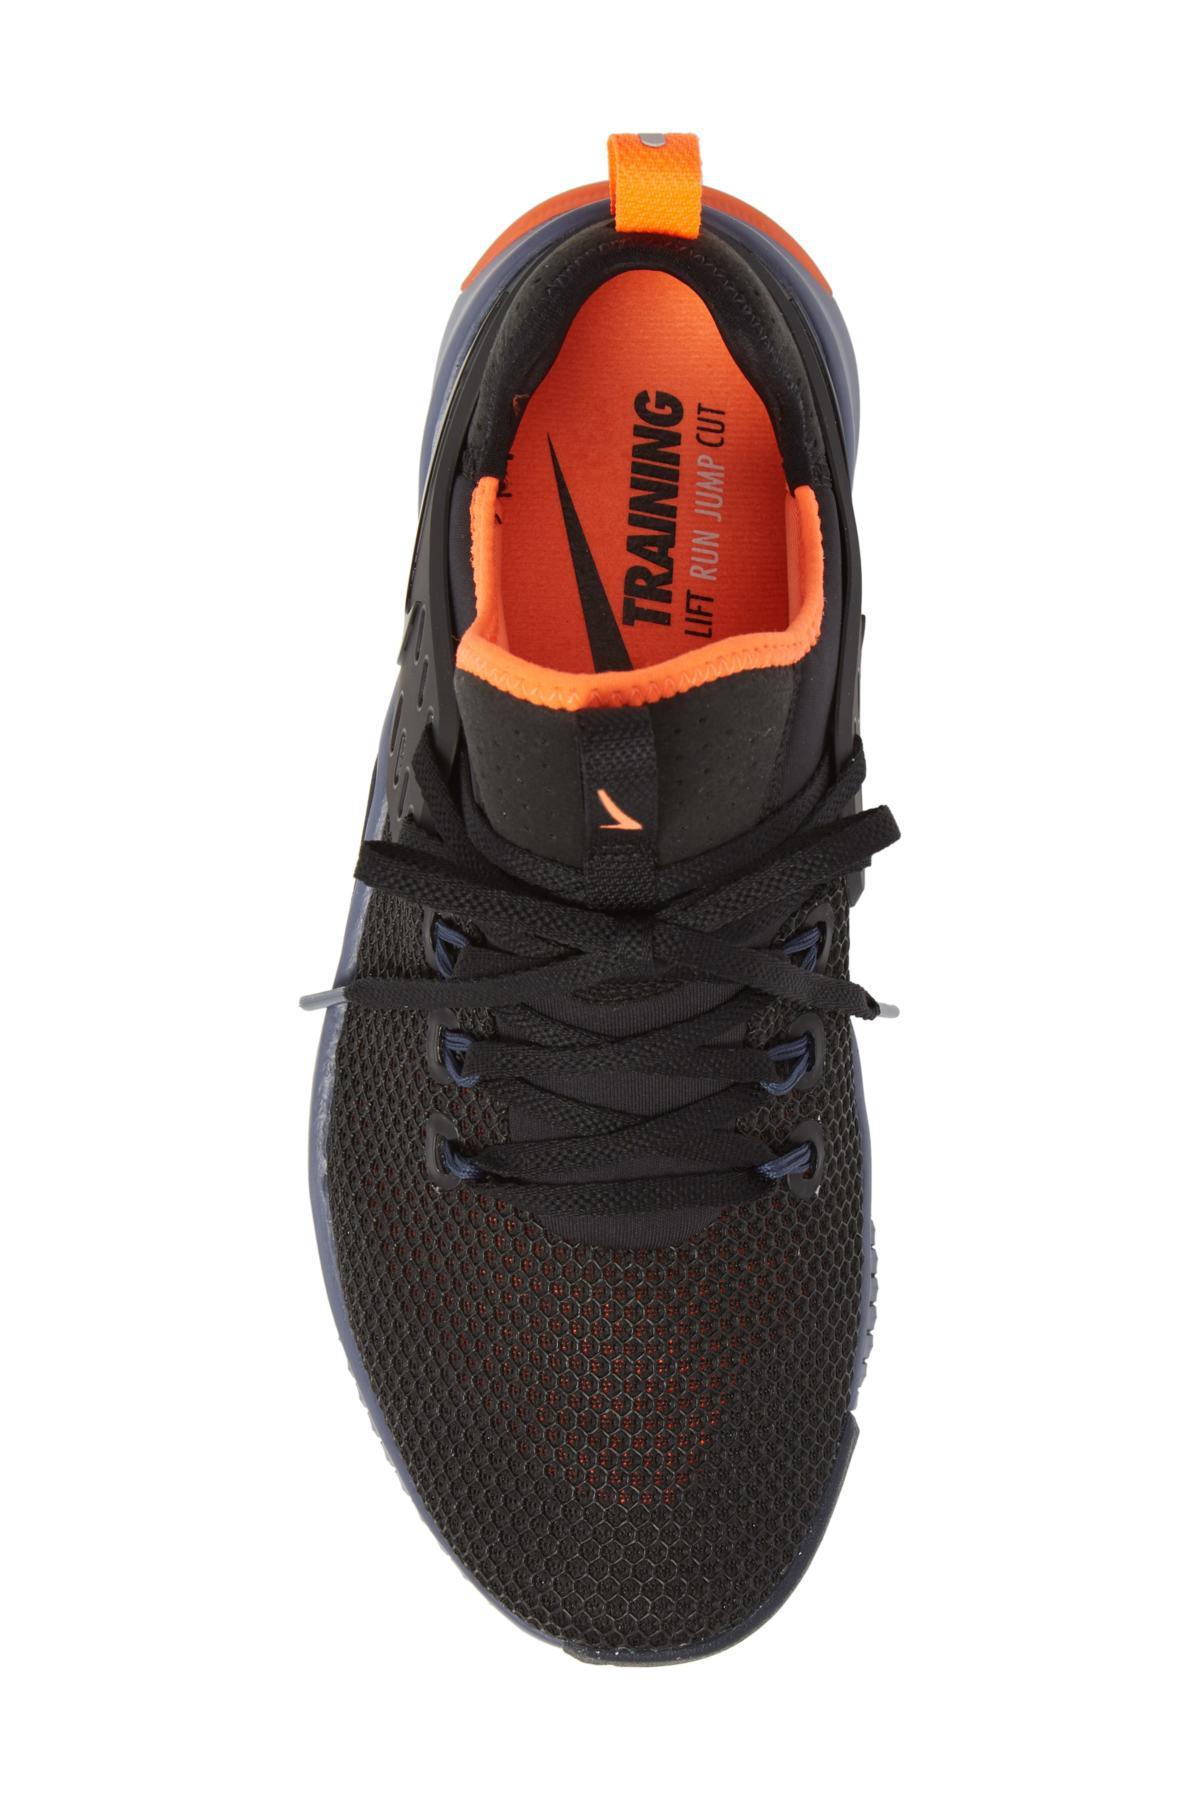 fcdff1189 nike-BLACKTHUNBL-48-Free-X-Metcon-Training-Shoe-men.jpeg